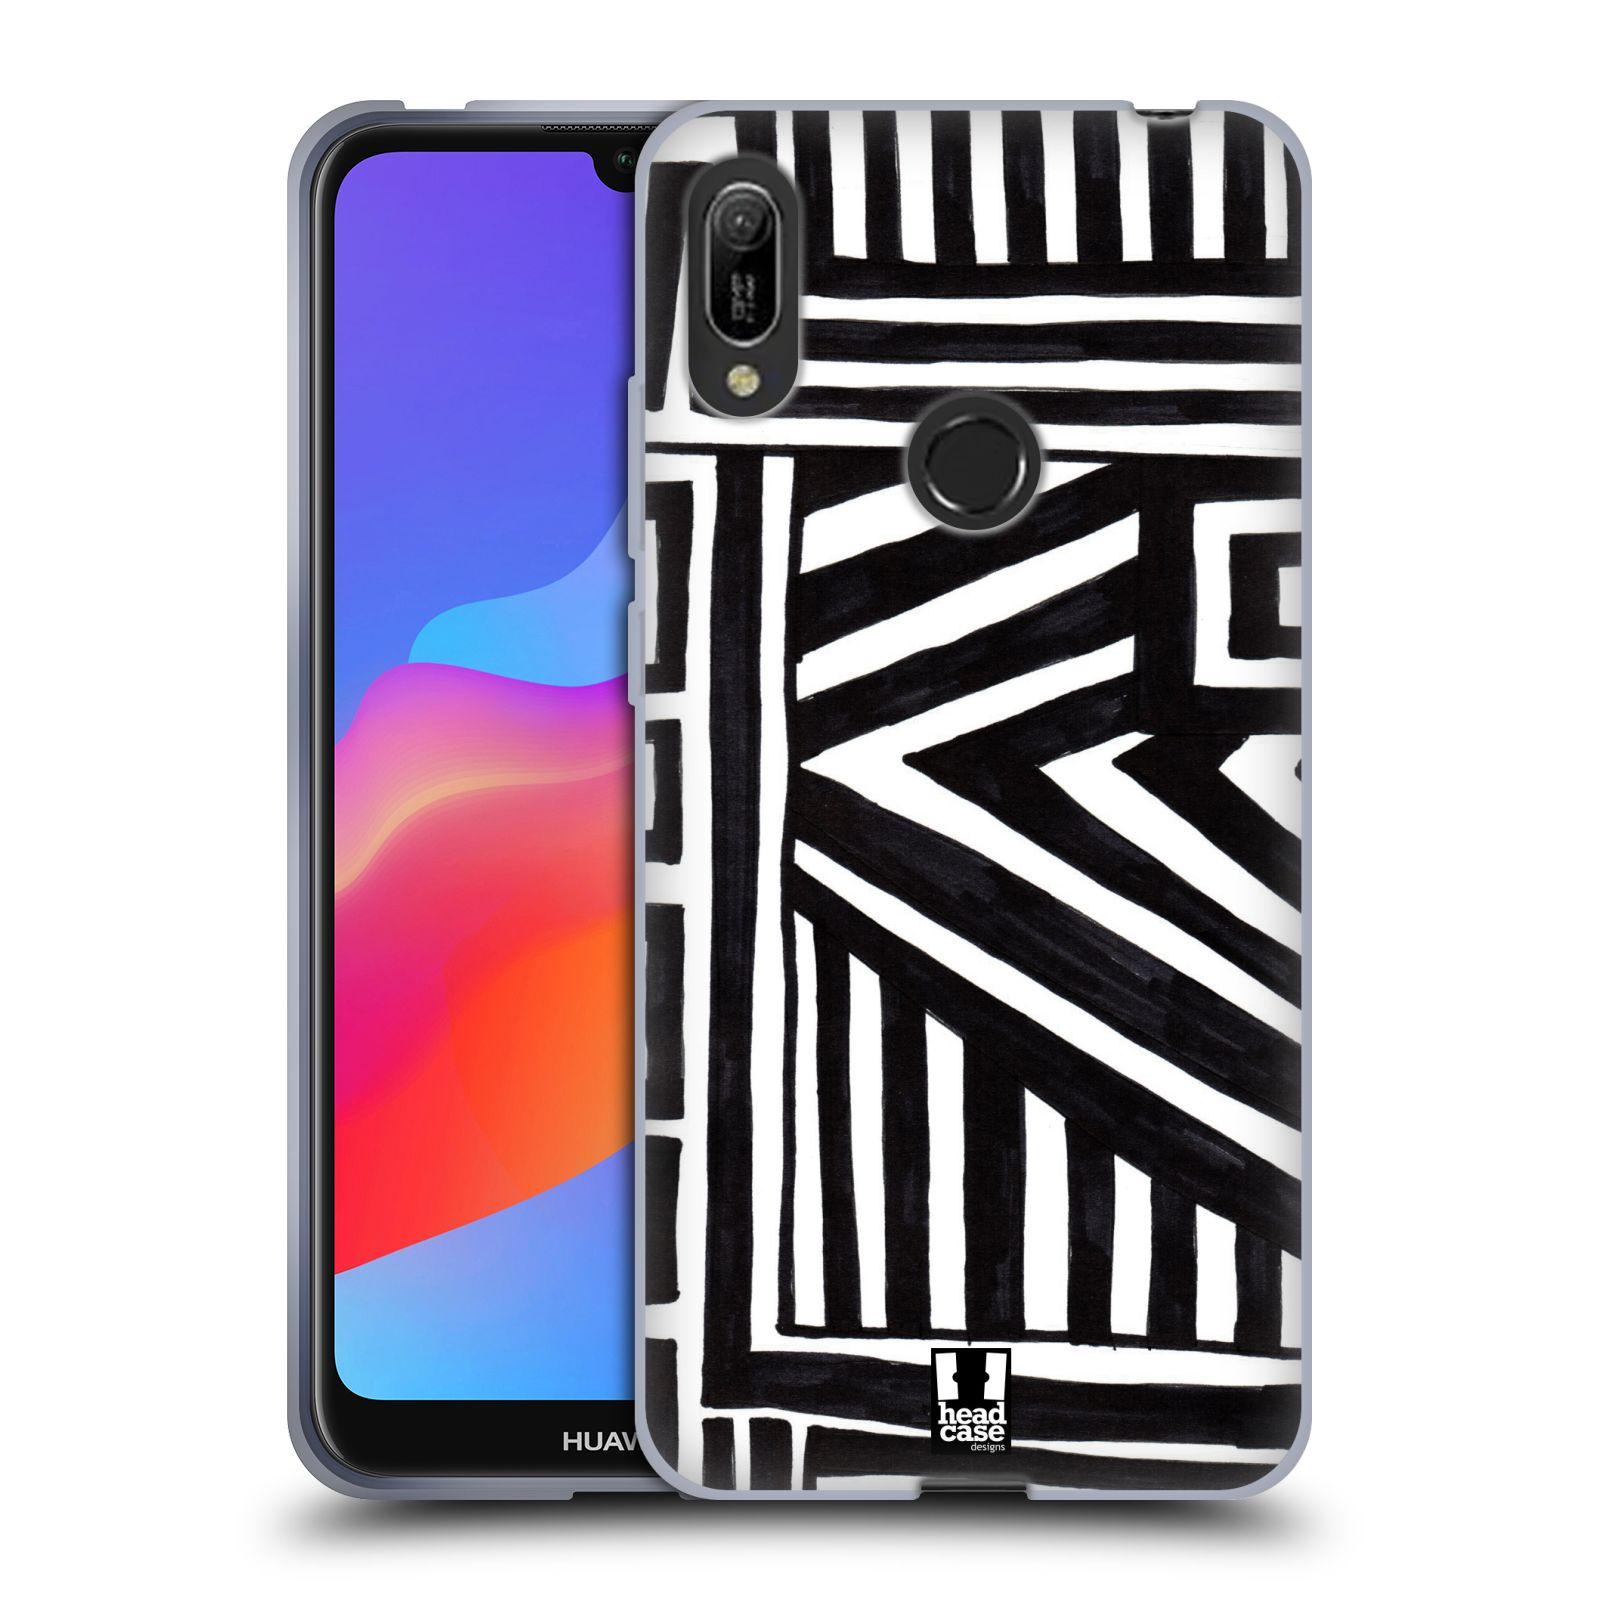 Silikonové pouzdro na mobil Huawei Y6 (2019) - Head Case - DOODLE GEOMETRIC